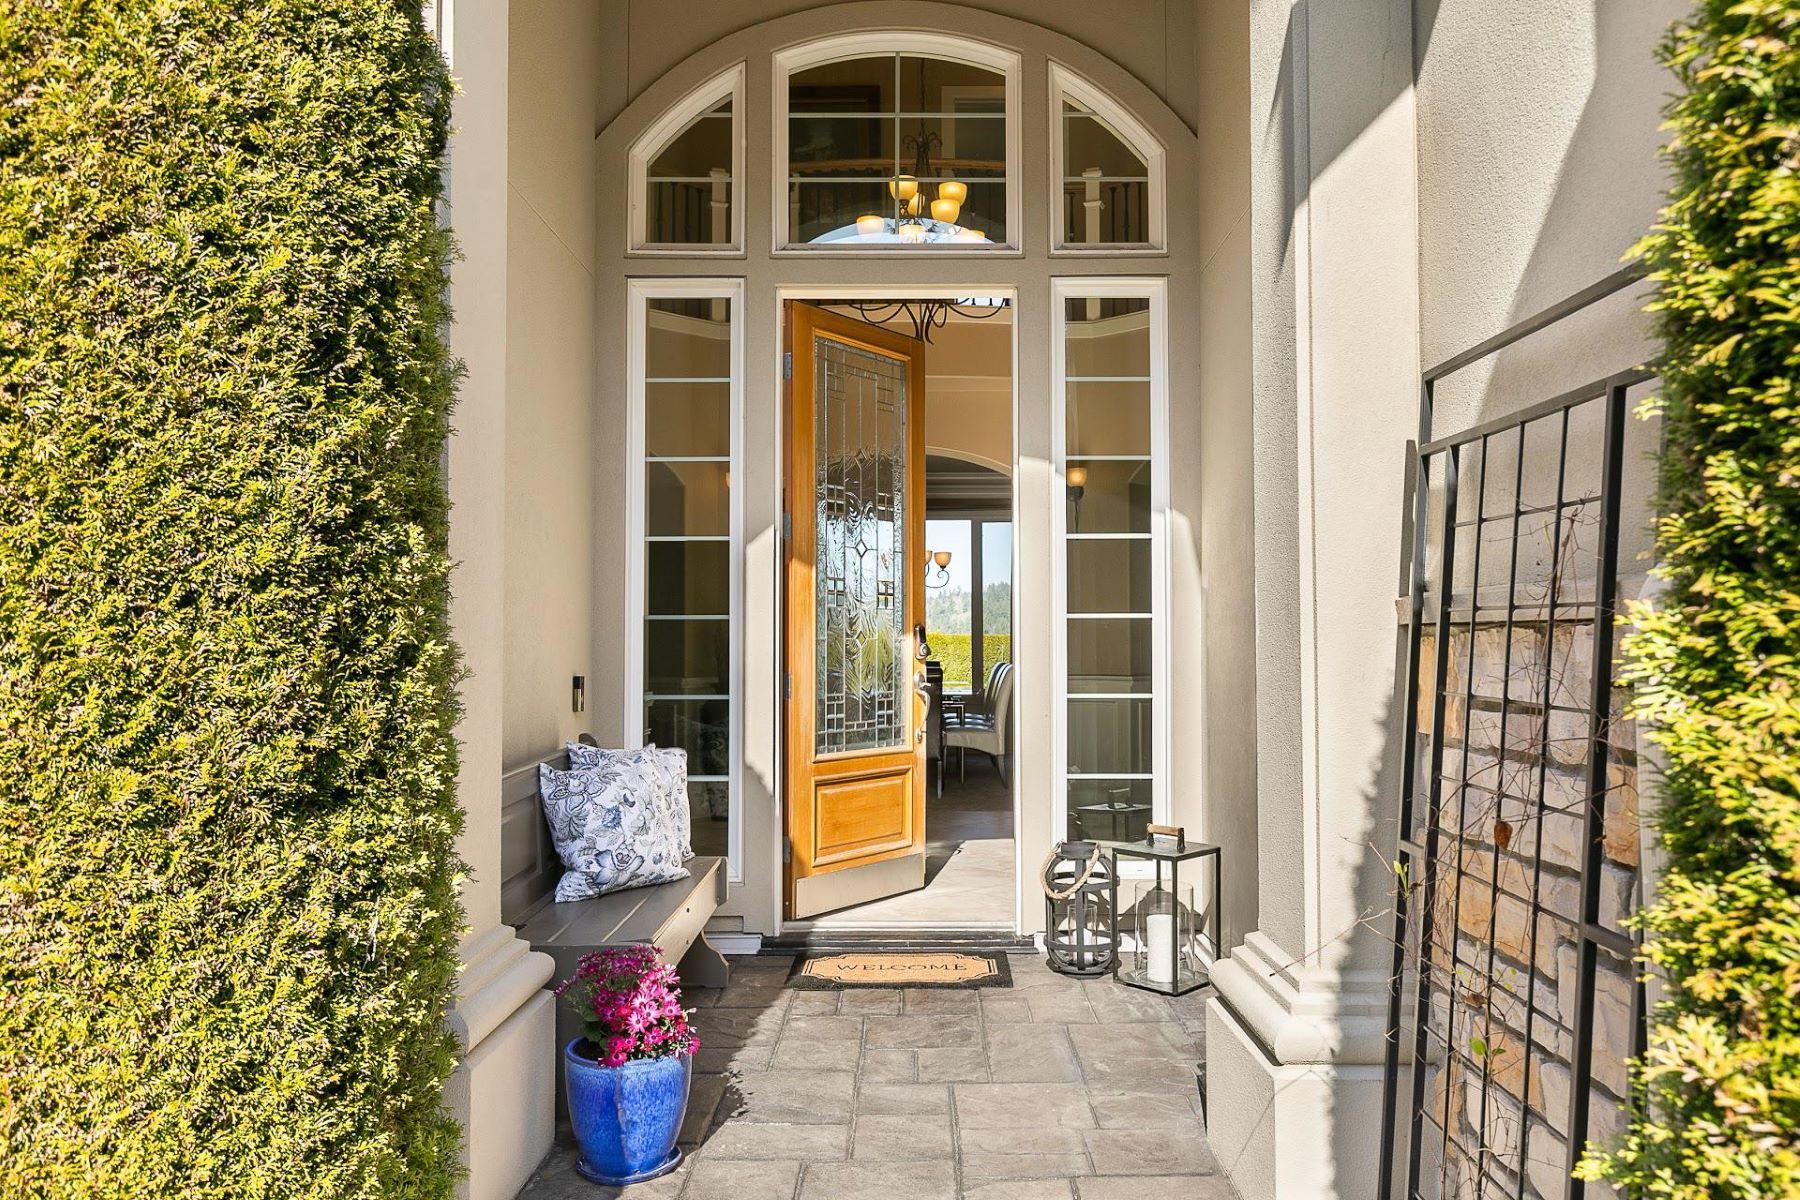 Single Family Homes for Sale at 8242 154th Avenue SE, Newcastle, WA 98059 8242 154th Ave SE Newcastle, Washington 98059 United States